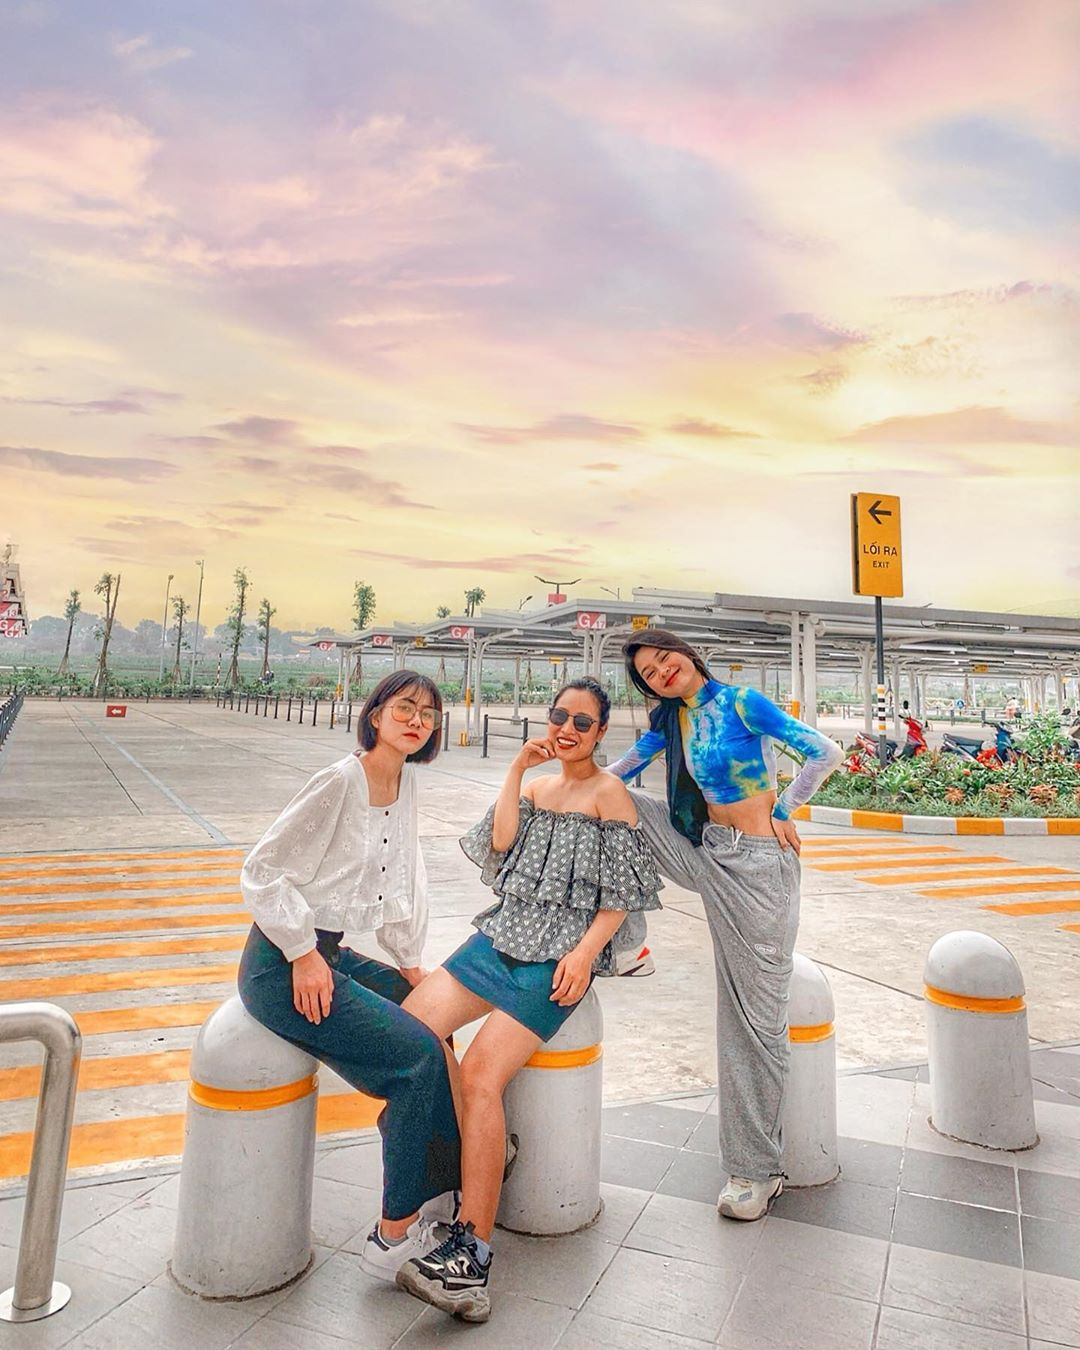 aeon-mall-ha-dong